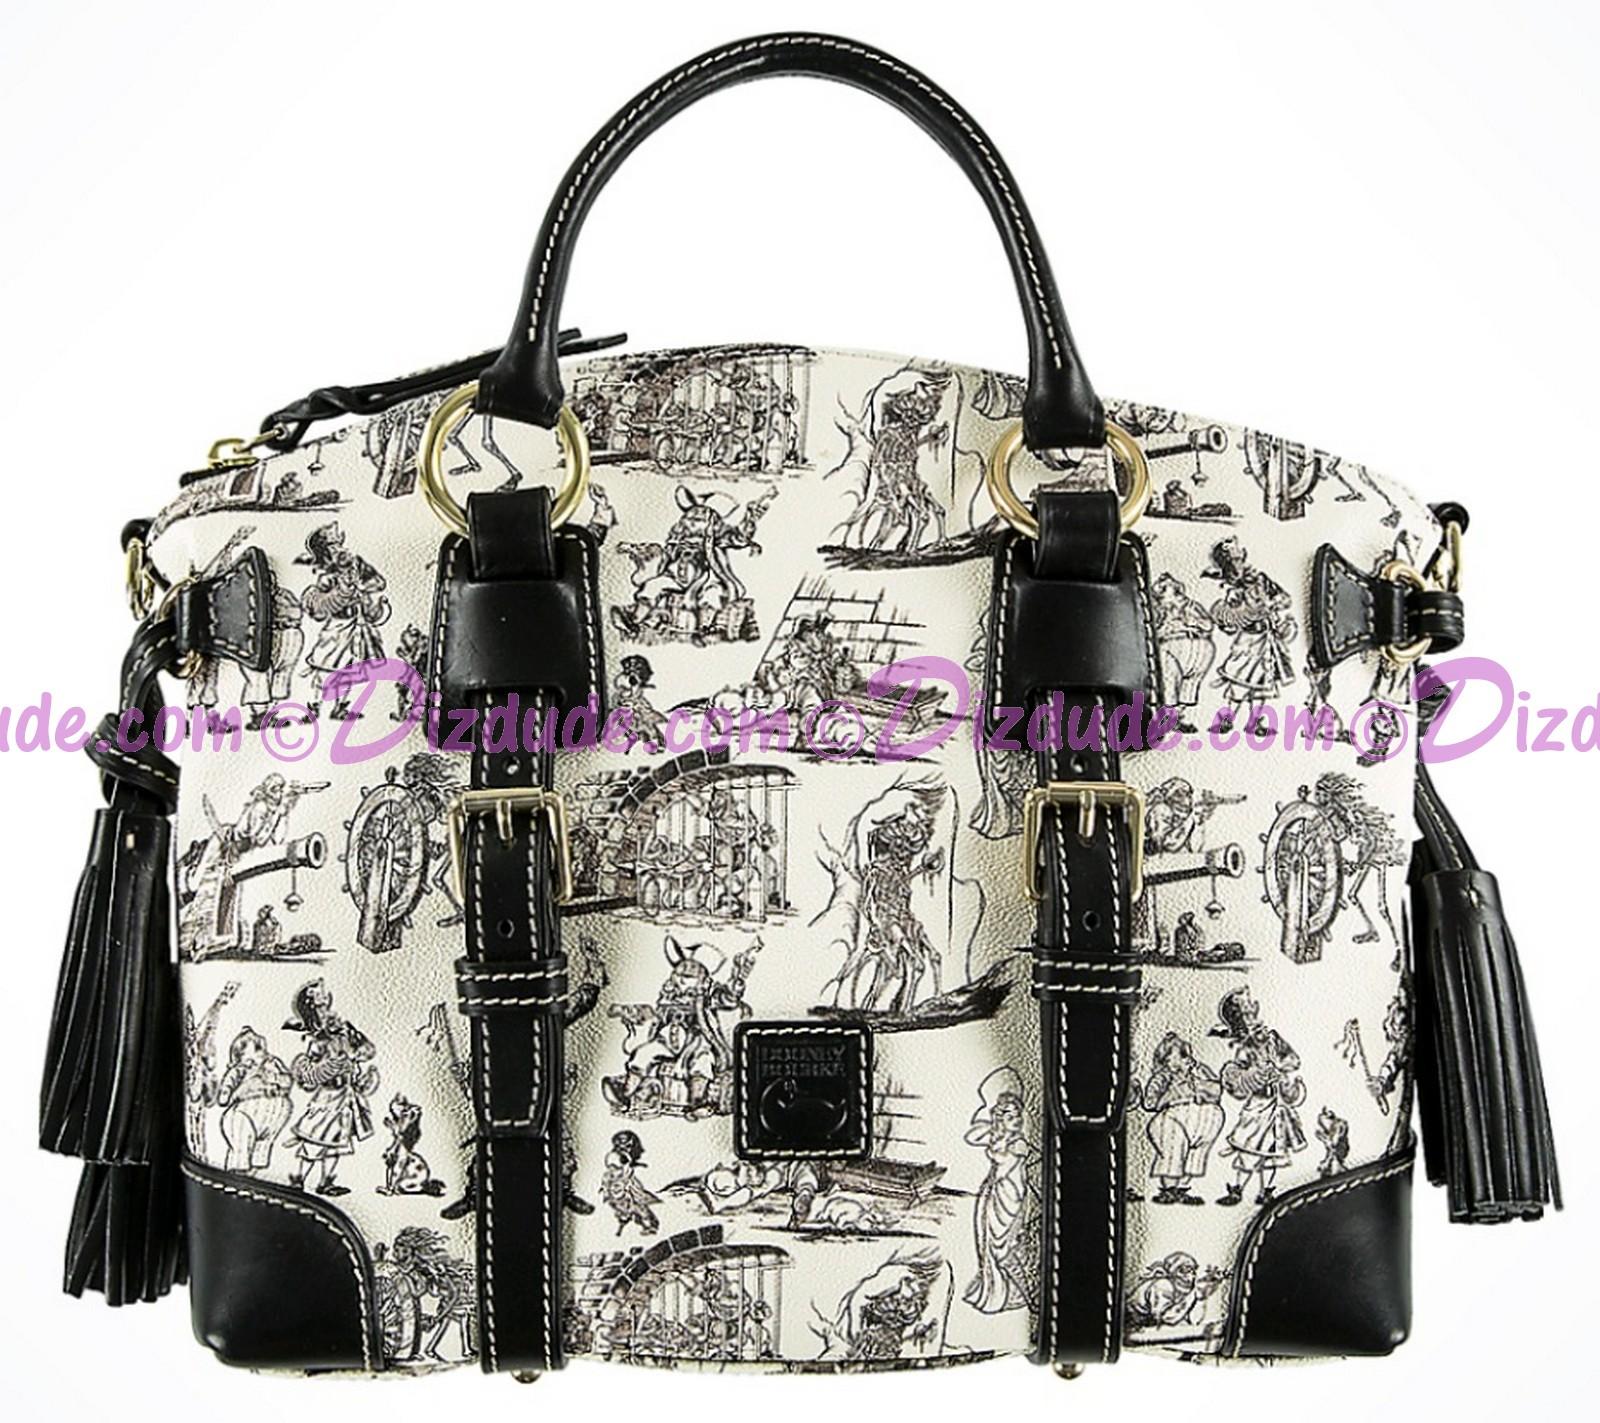 Dooney & Bourke Pirates of the Caribbean Satchel Handbag - Disney World Exclusive © Dizdude.com